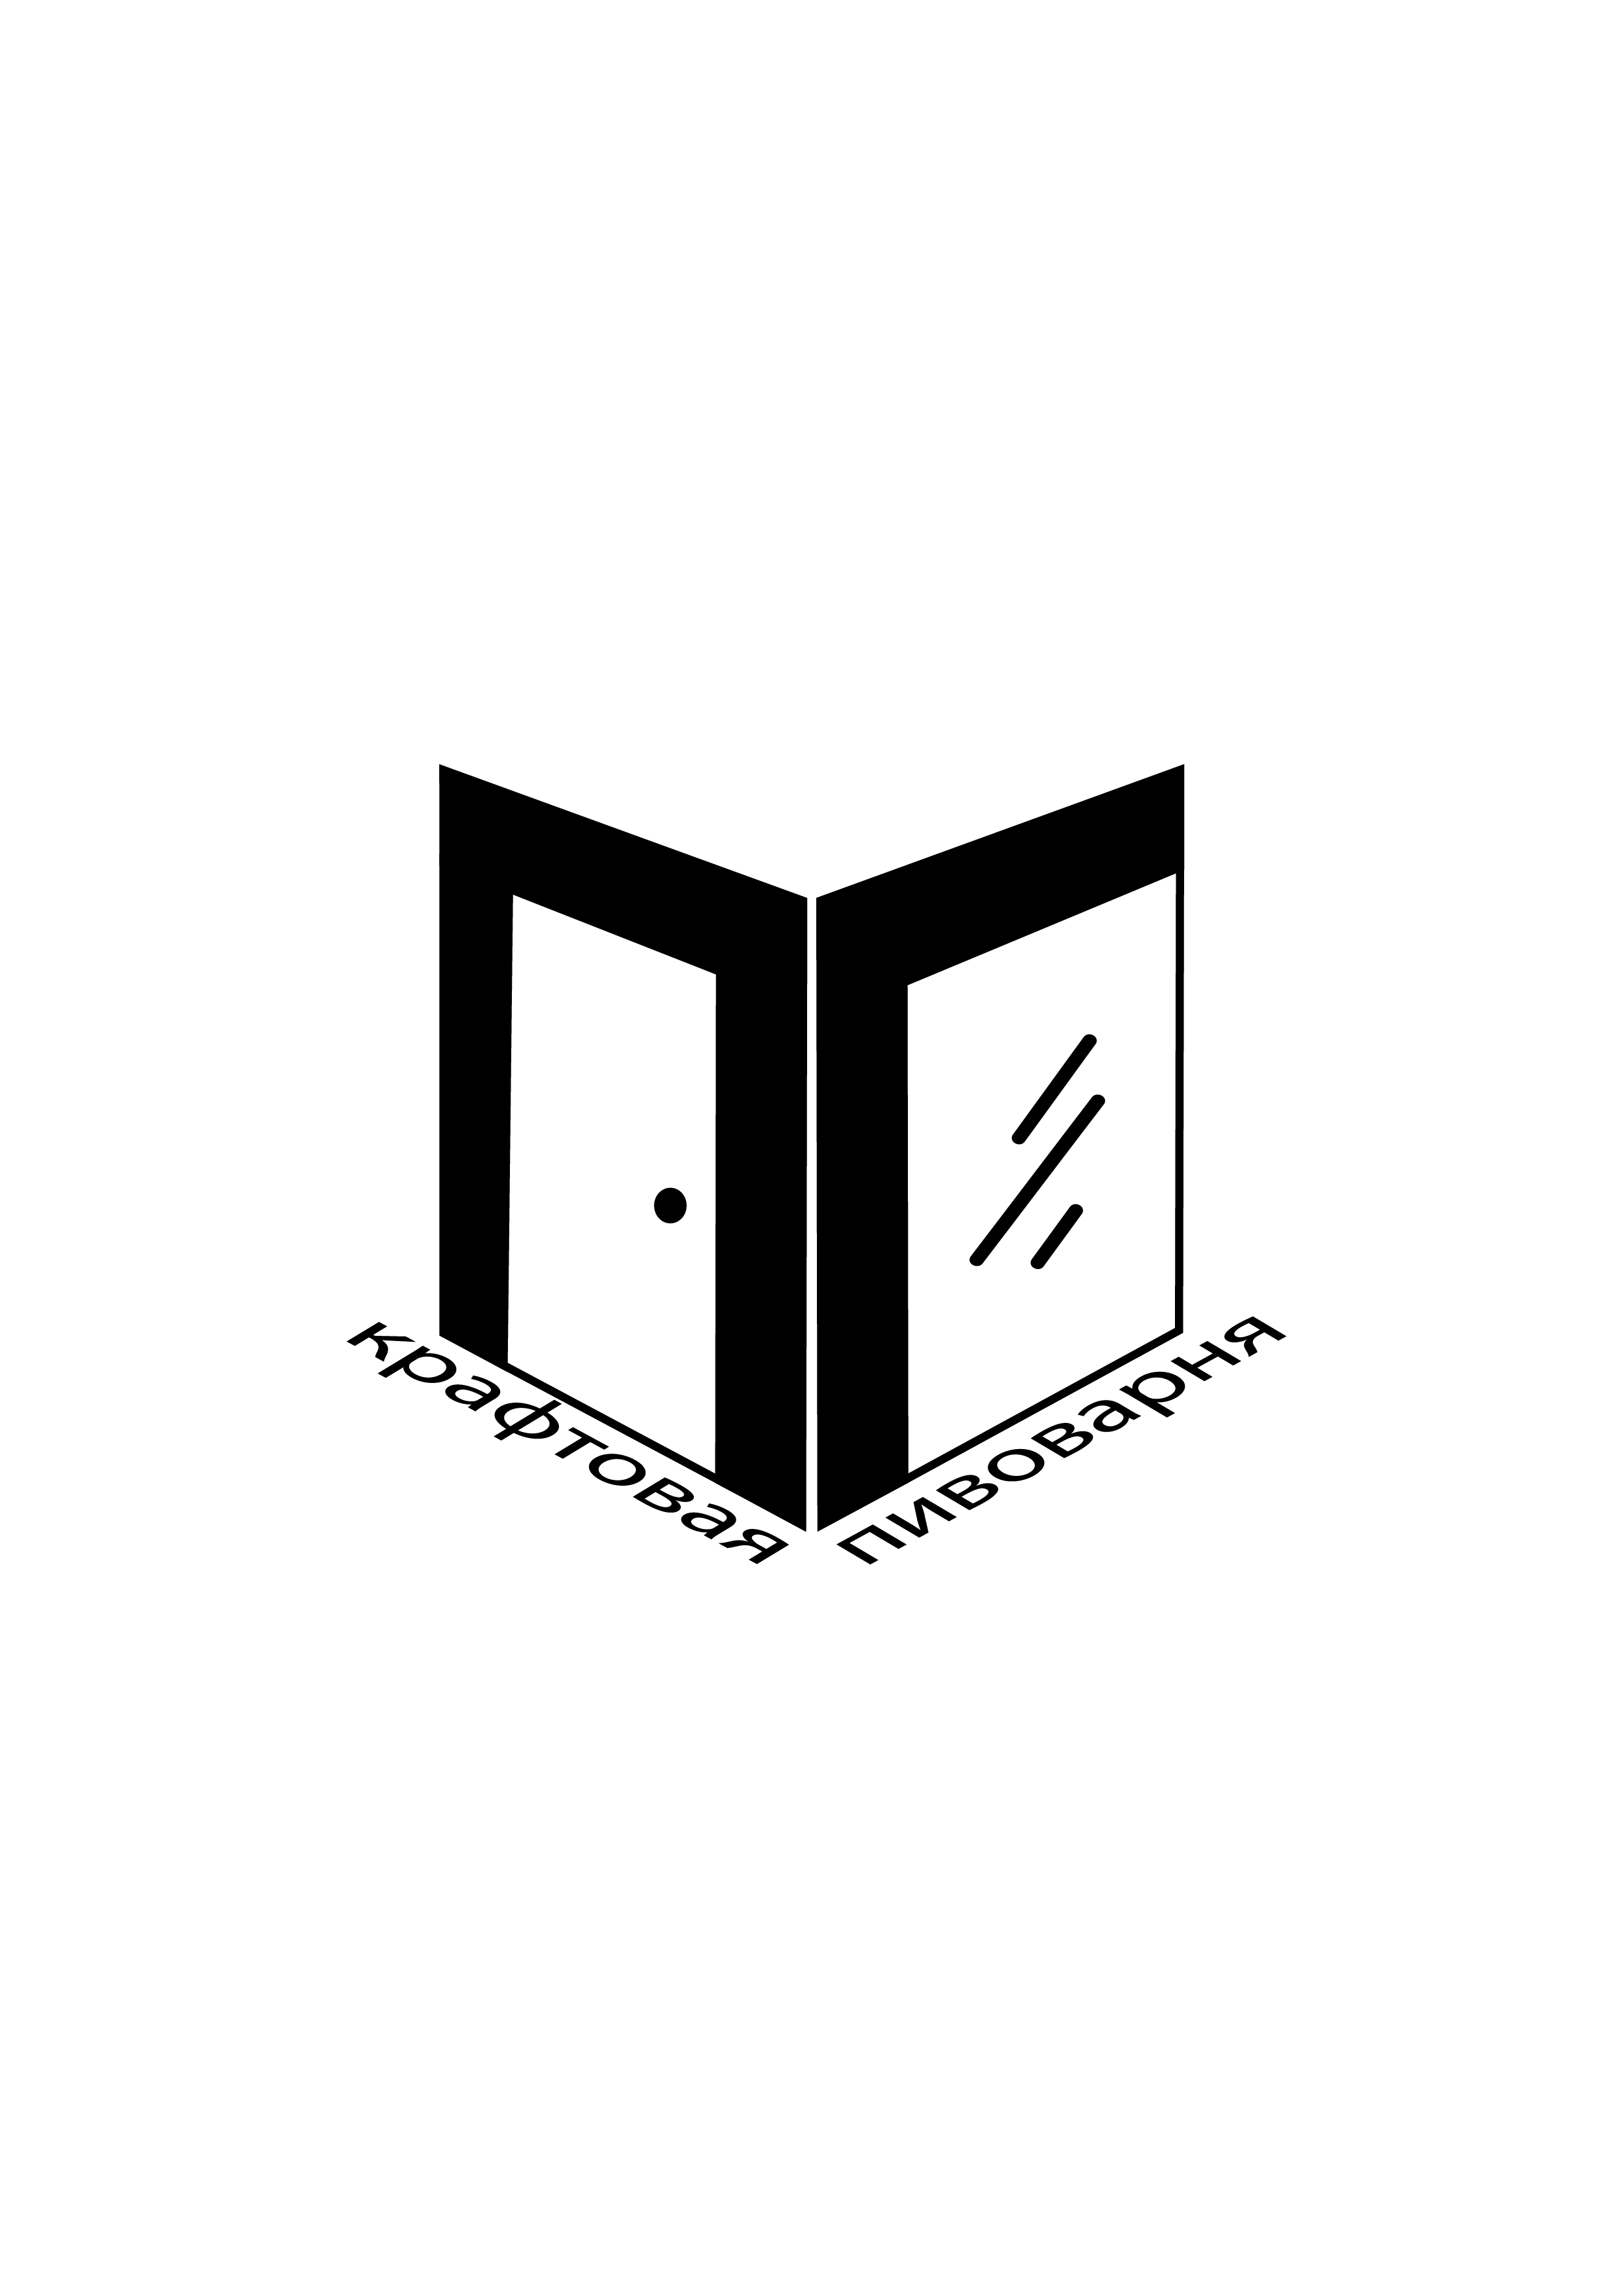 Логотип для Крафтовой Пивоварни фото f_4455cb0b9f9d877b.png